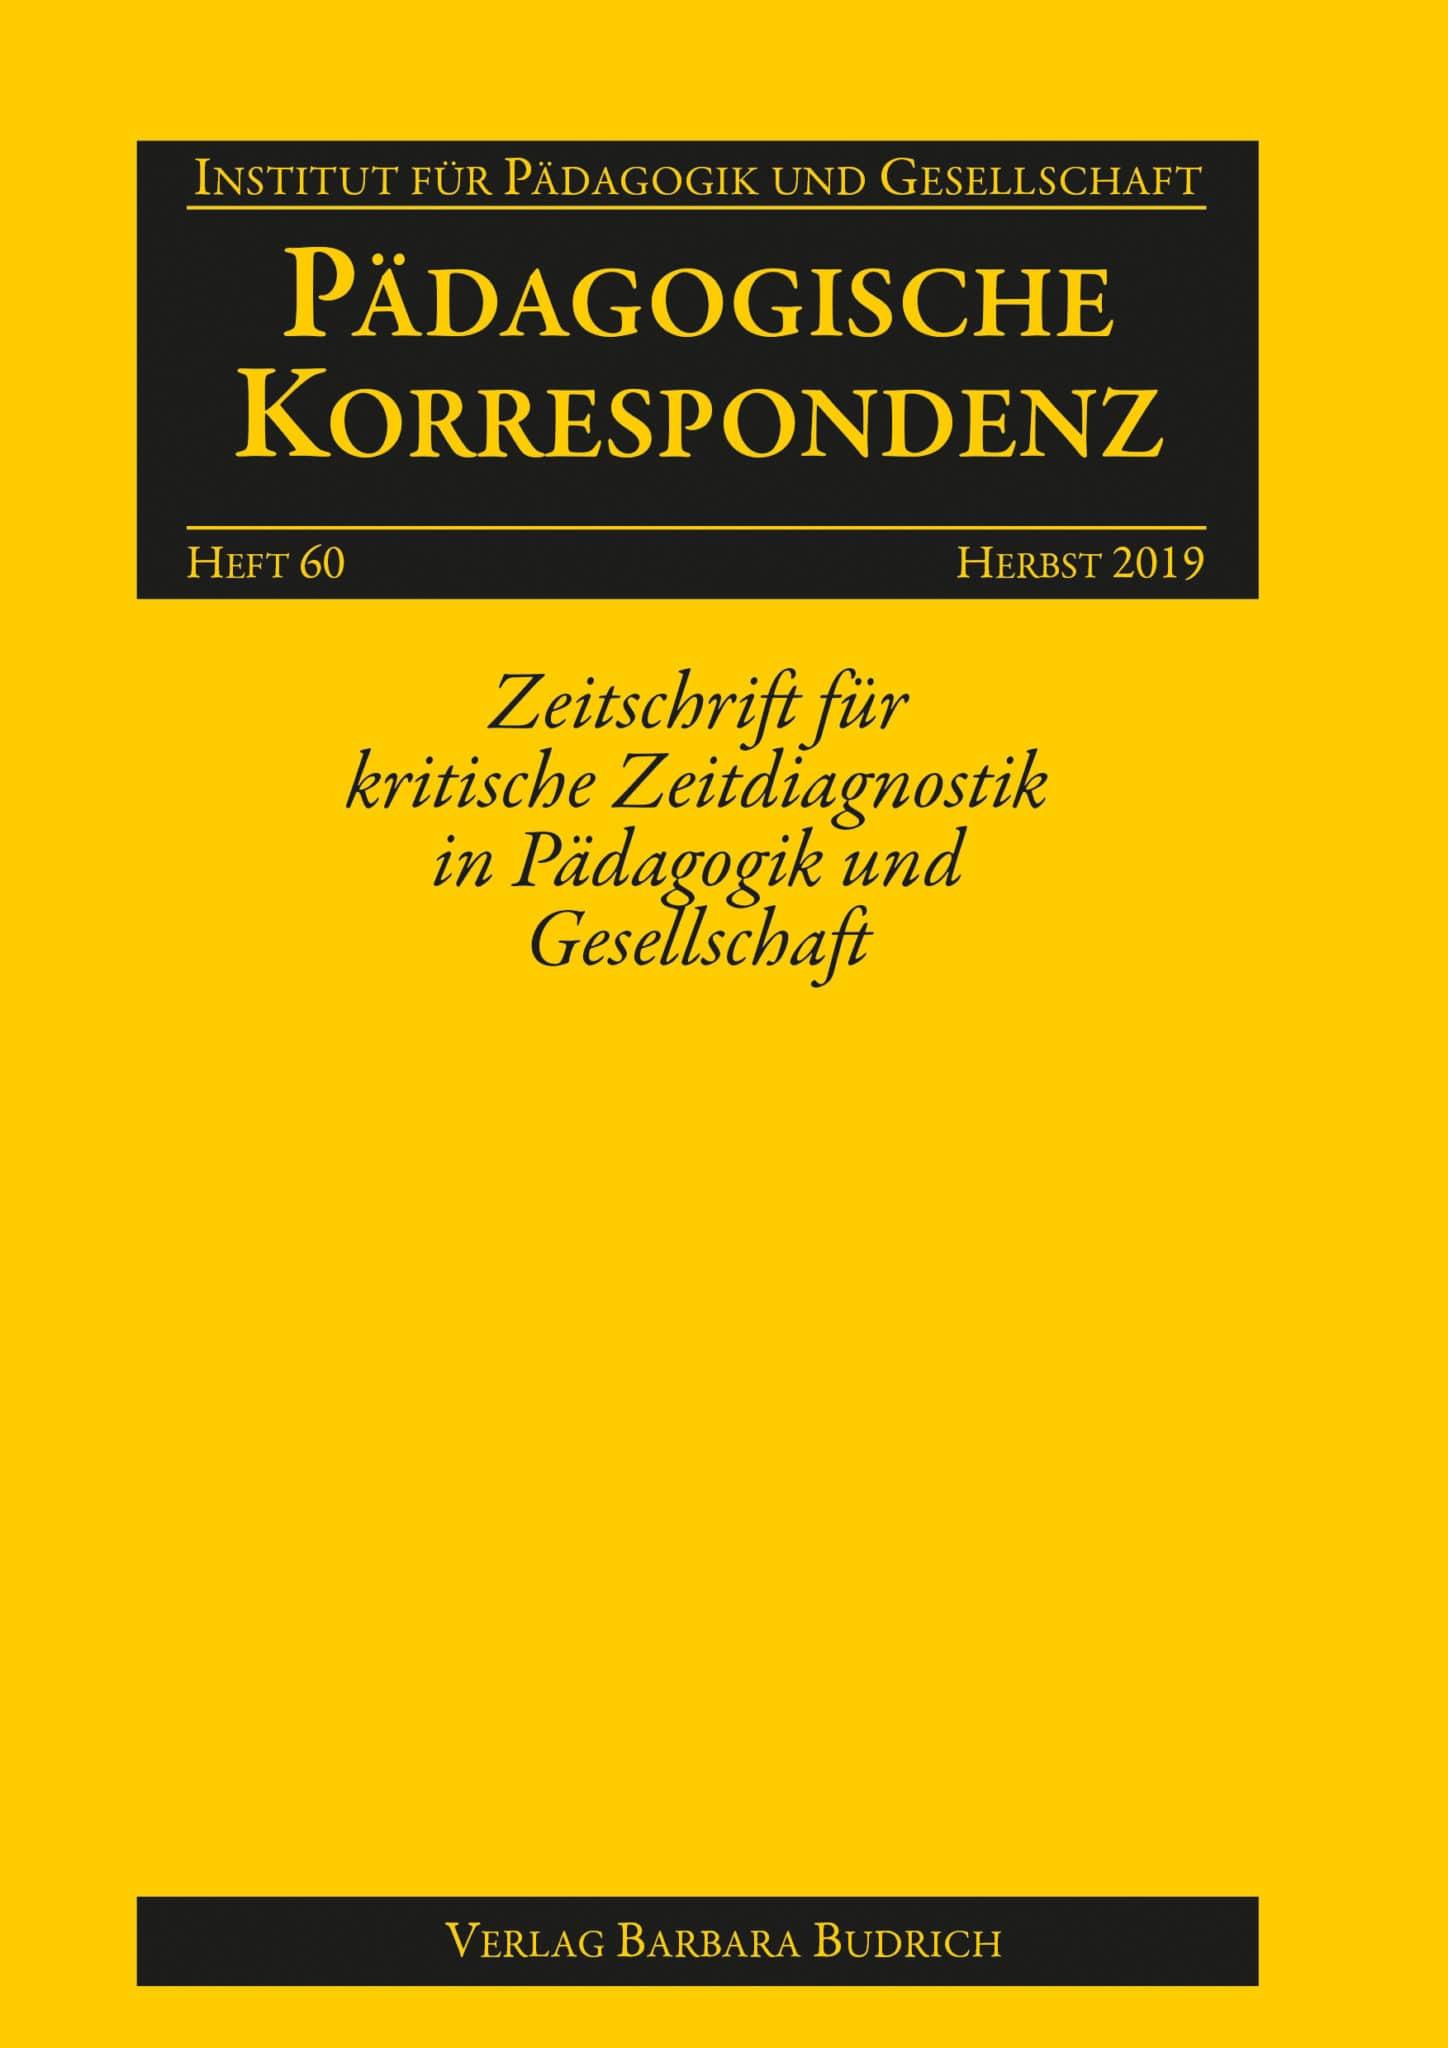 Pädagogische Korrespondenz, Heft 60, 2-2019: Freie Beiträge